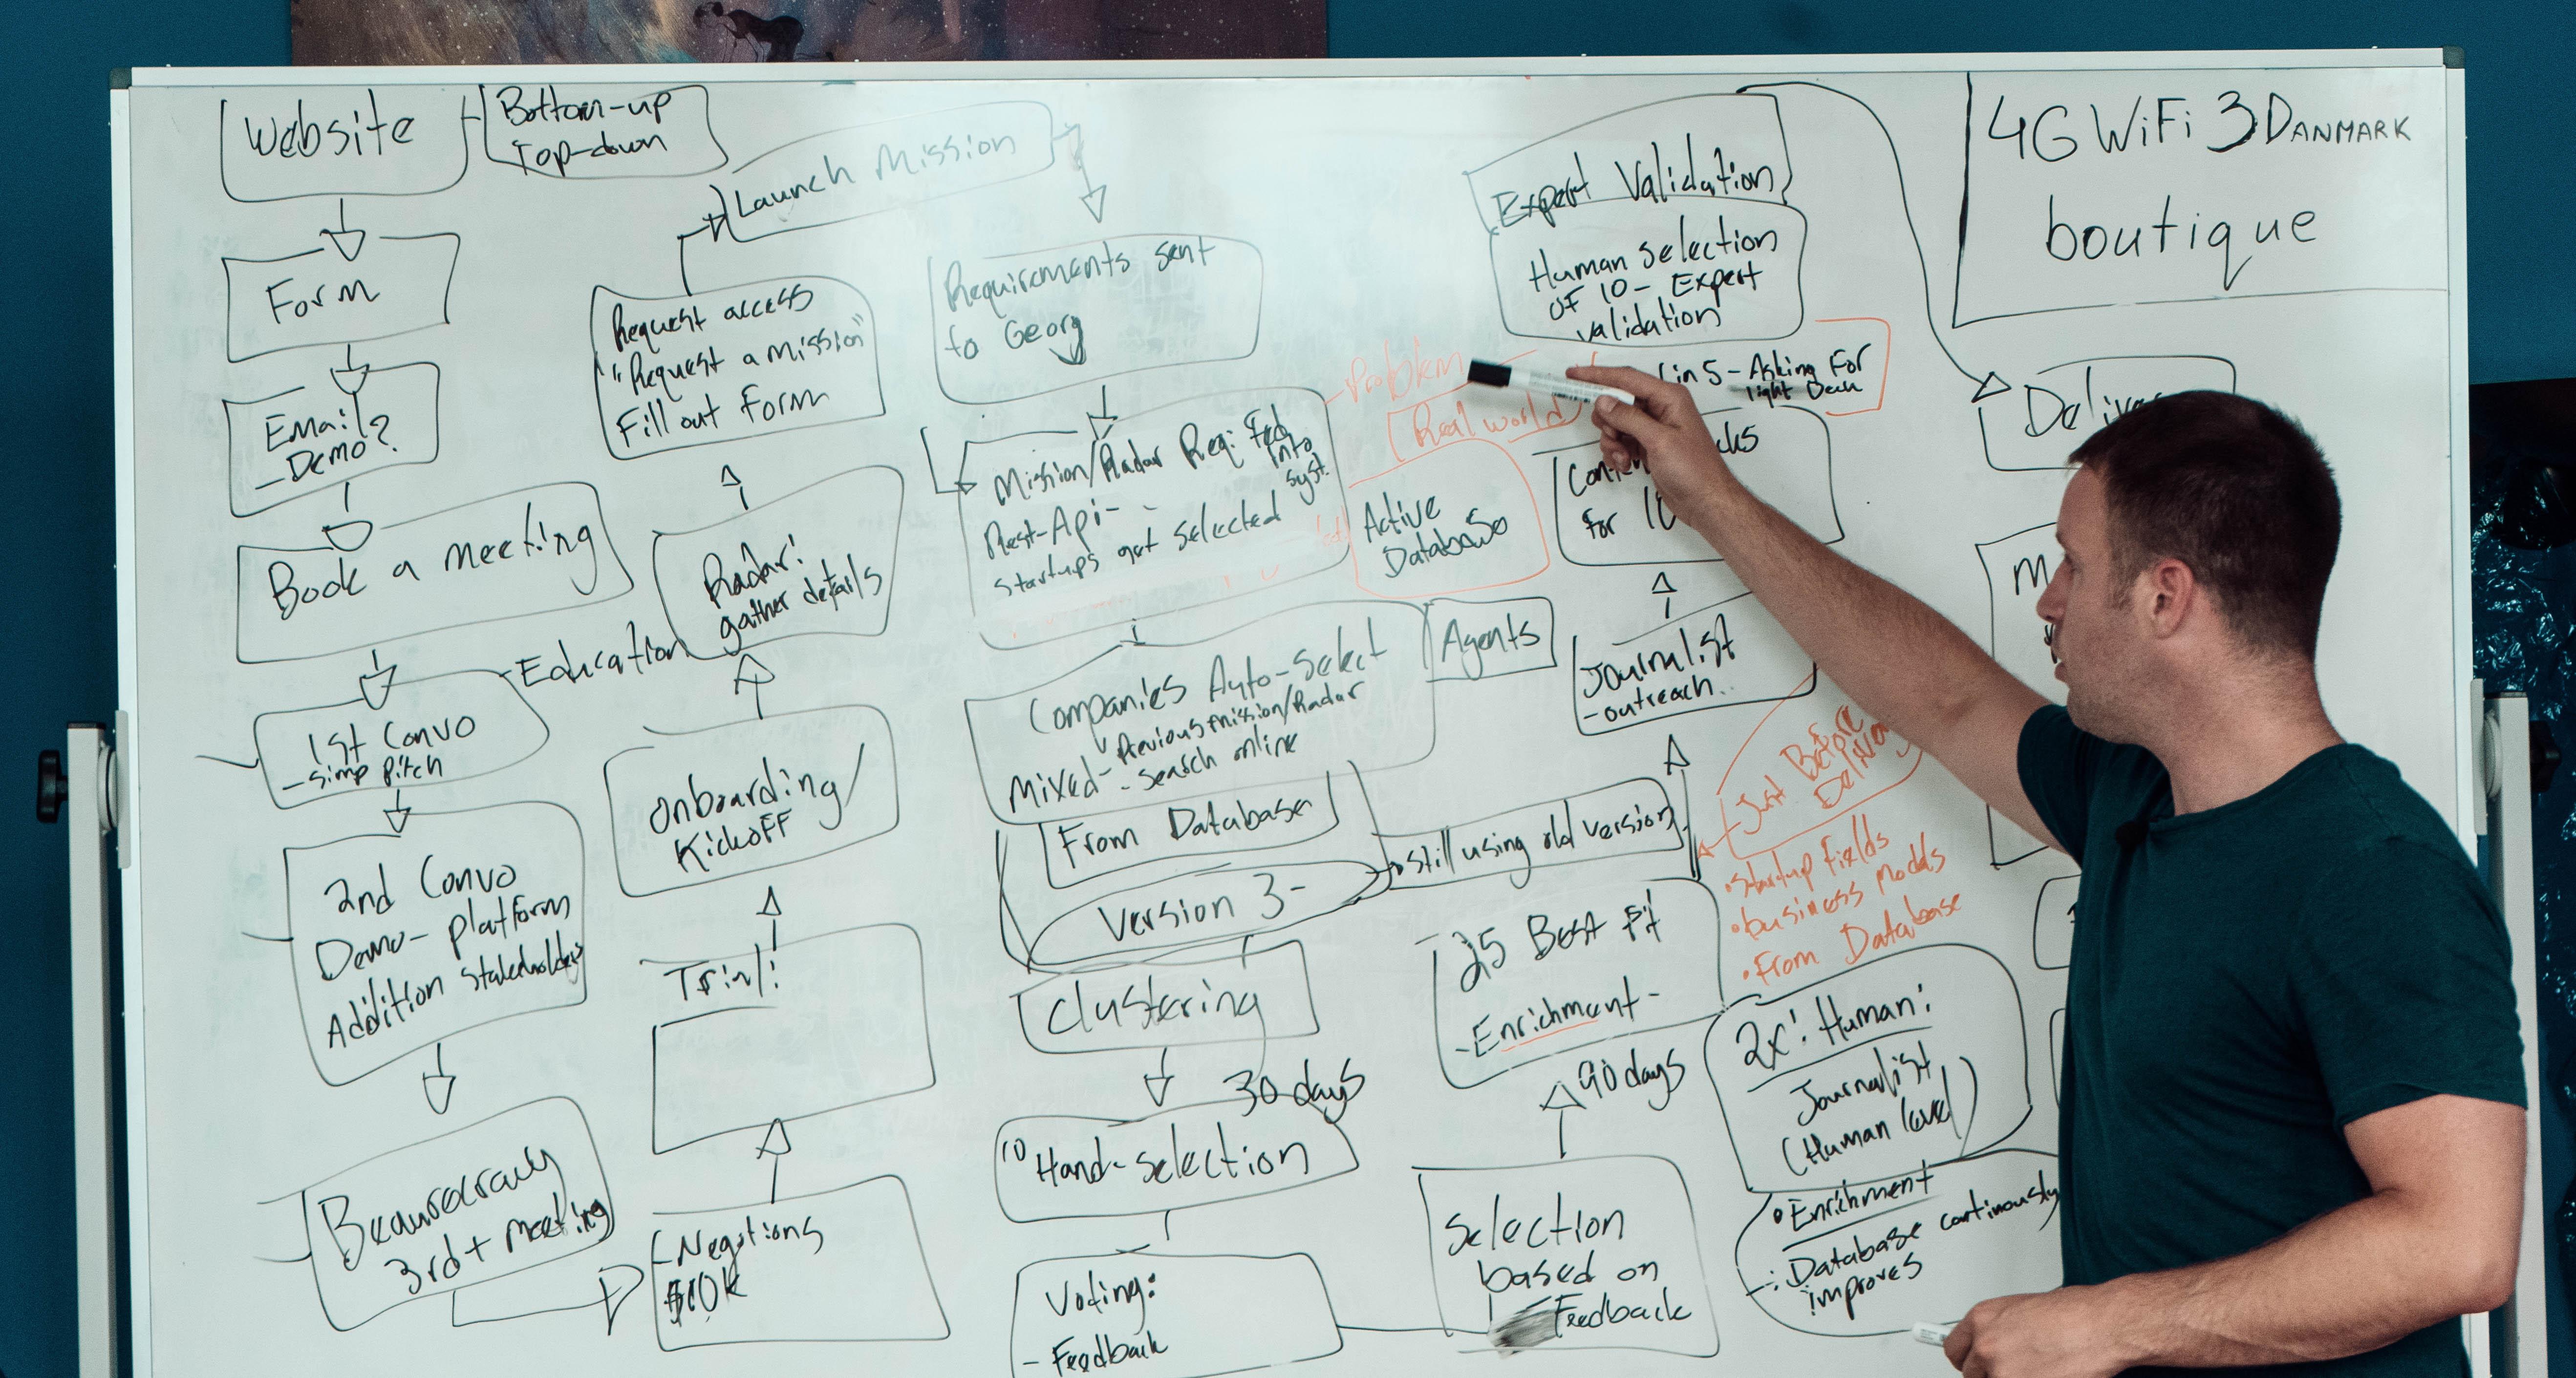 Marketing tech stack